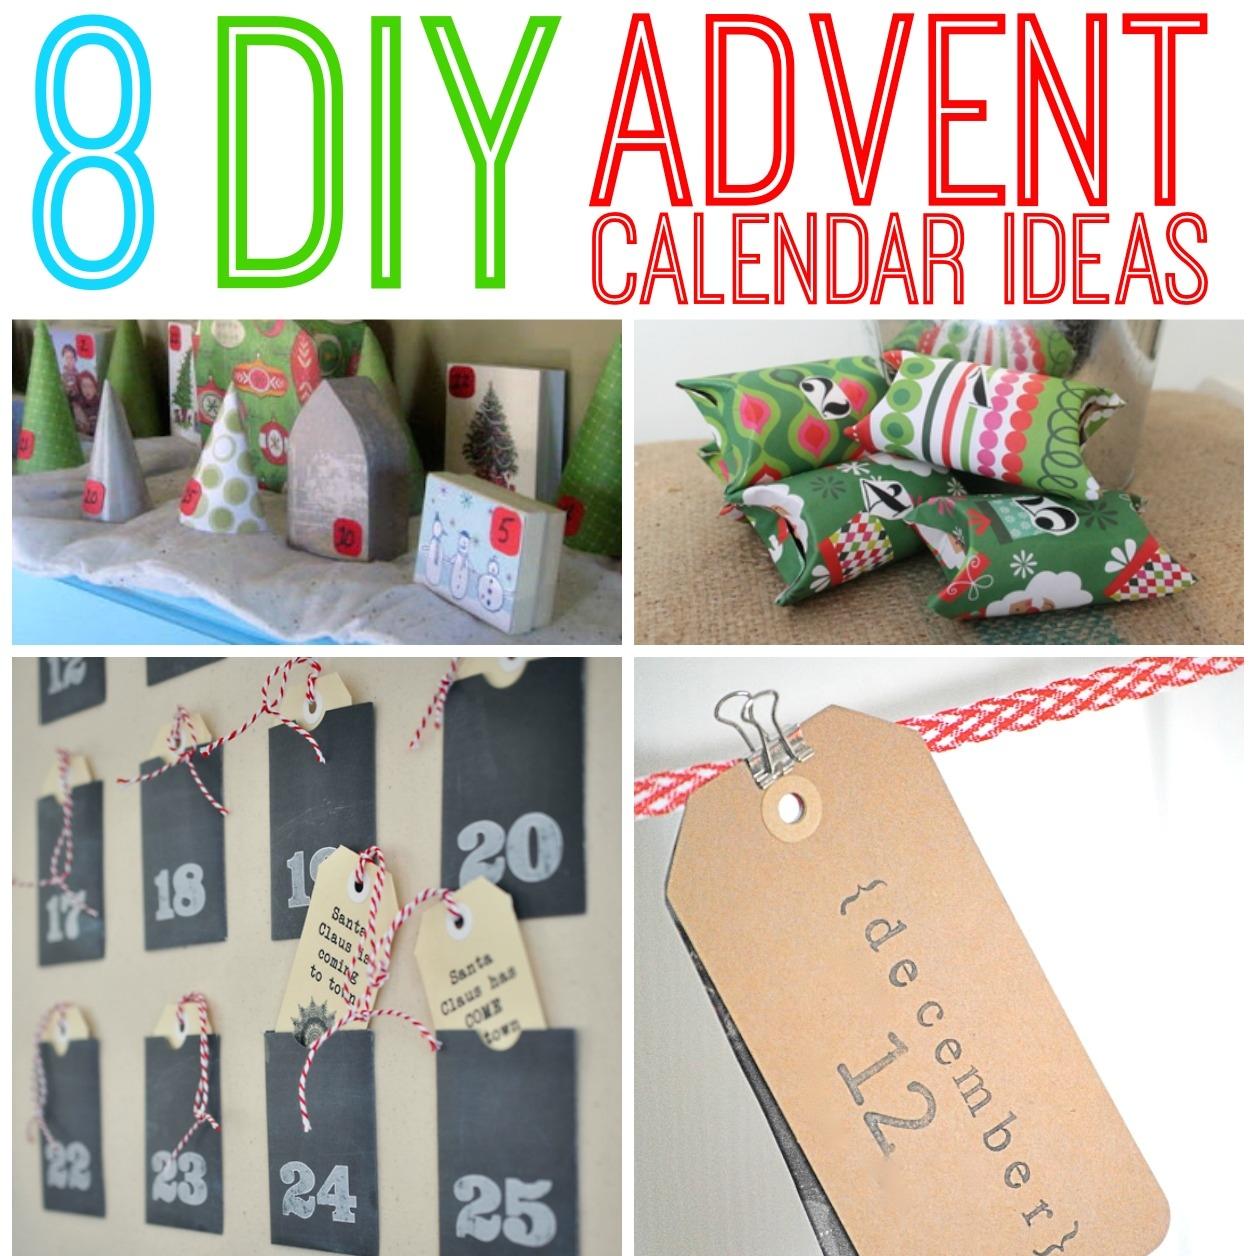 diy advent calendar ideas all things g d. Black Bedroom Furniture Sets. Home Design Ideas